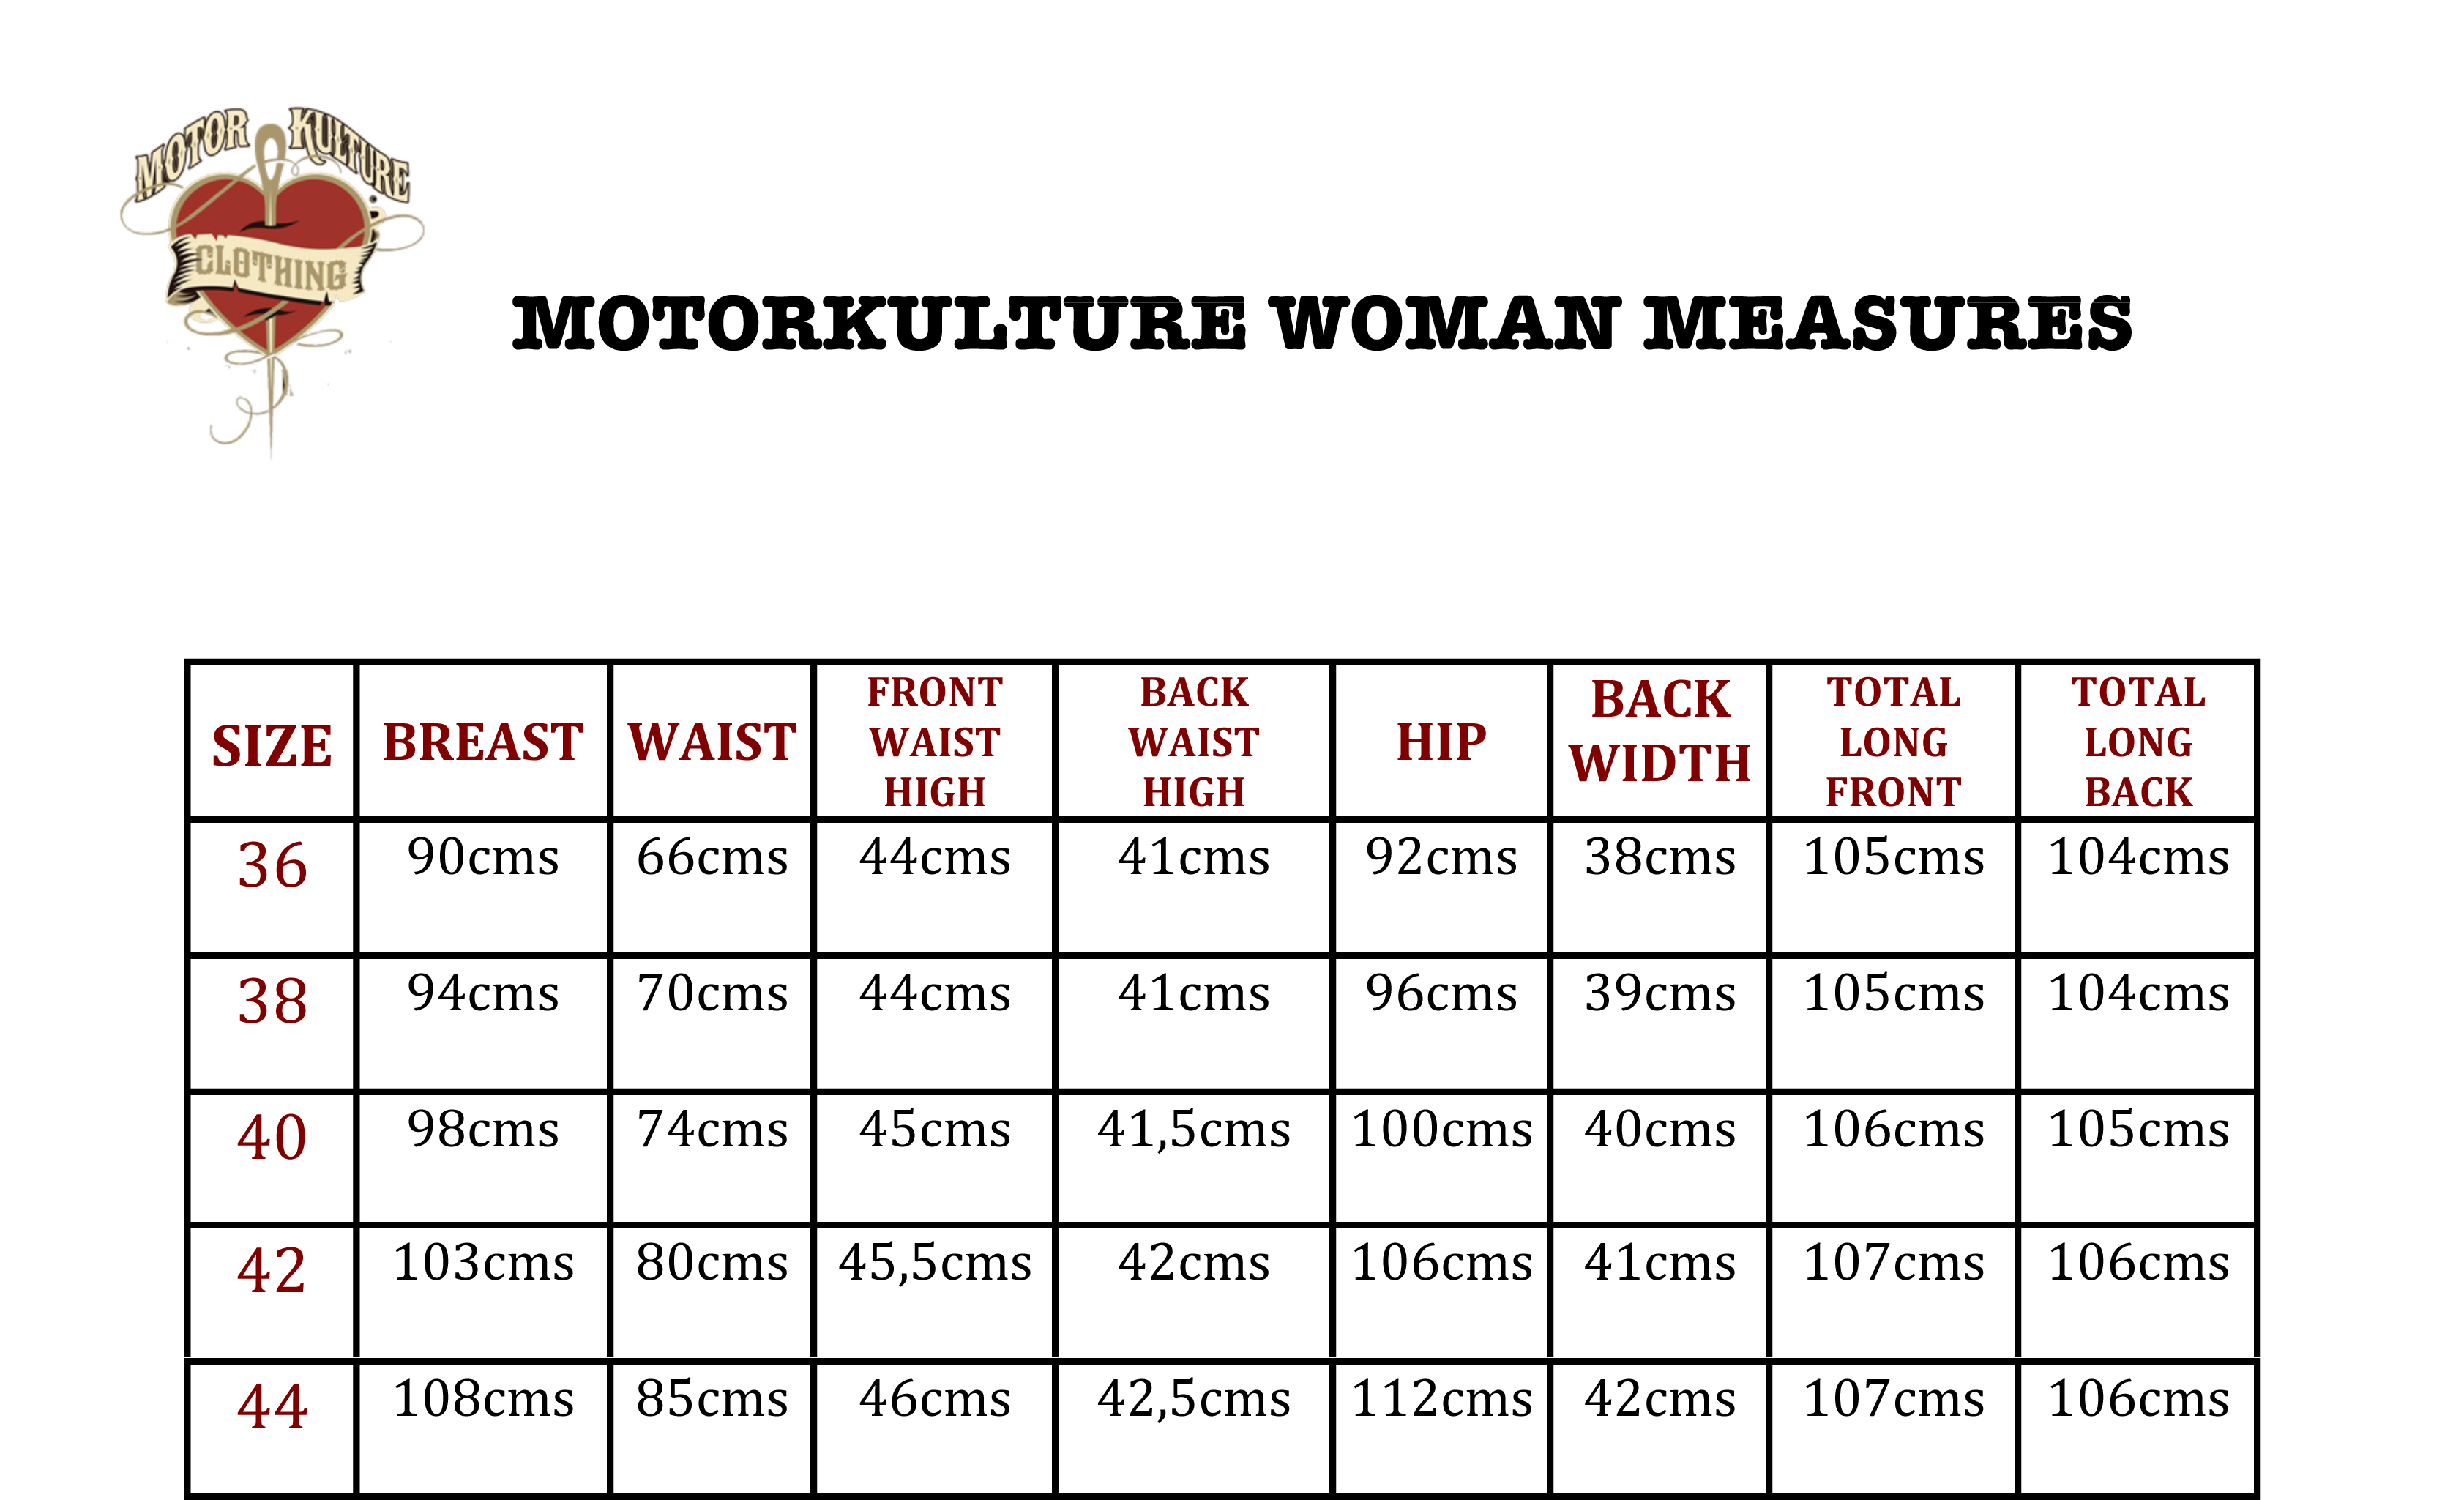 MKC Woman Measures